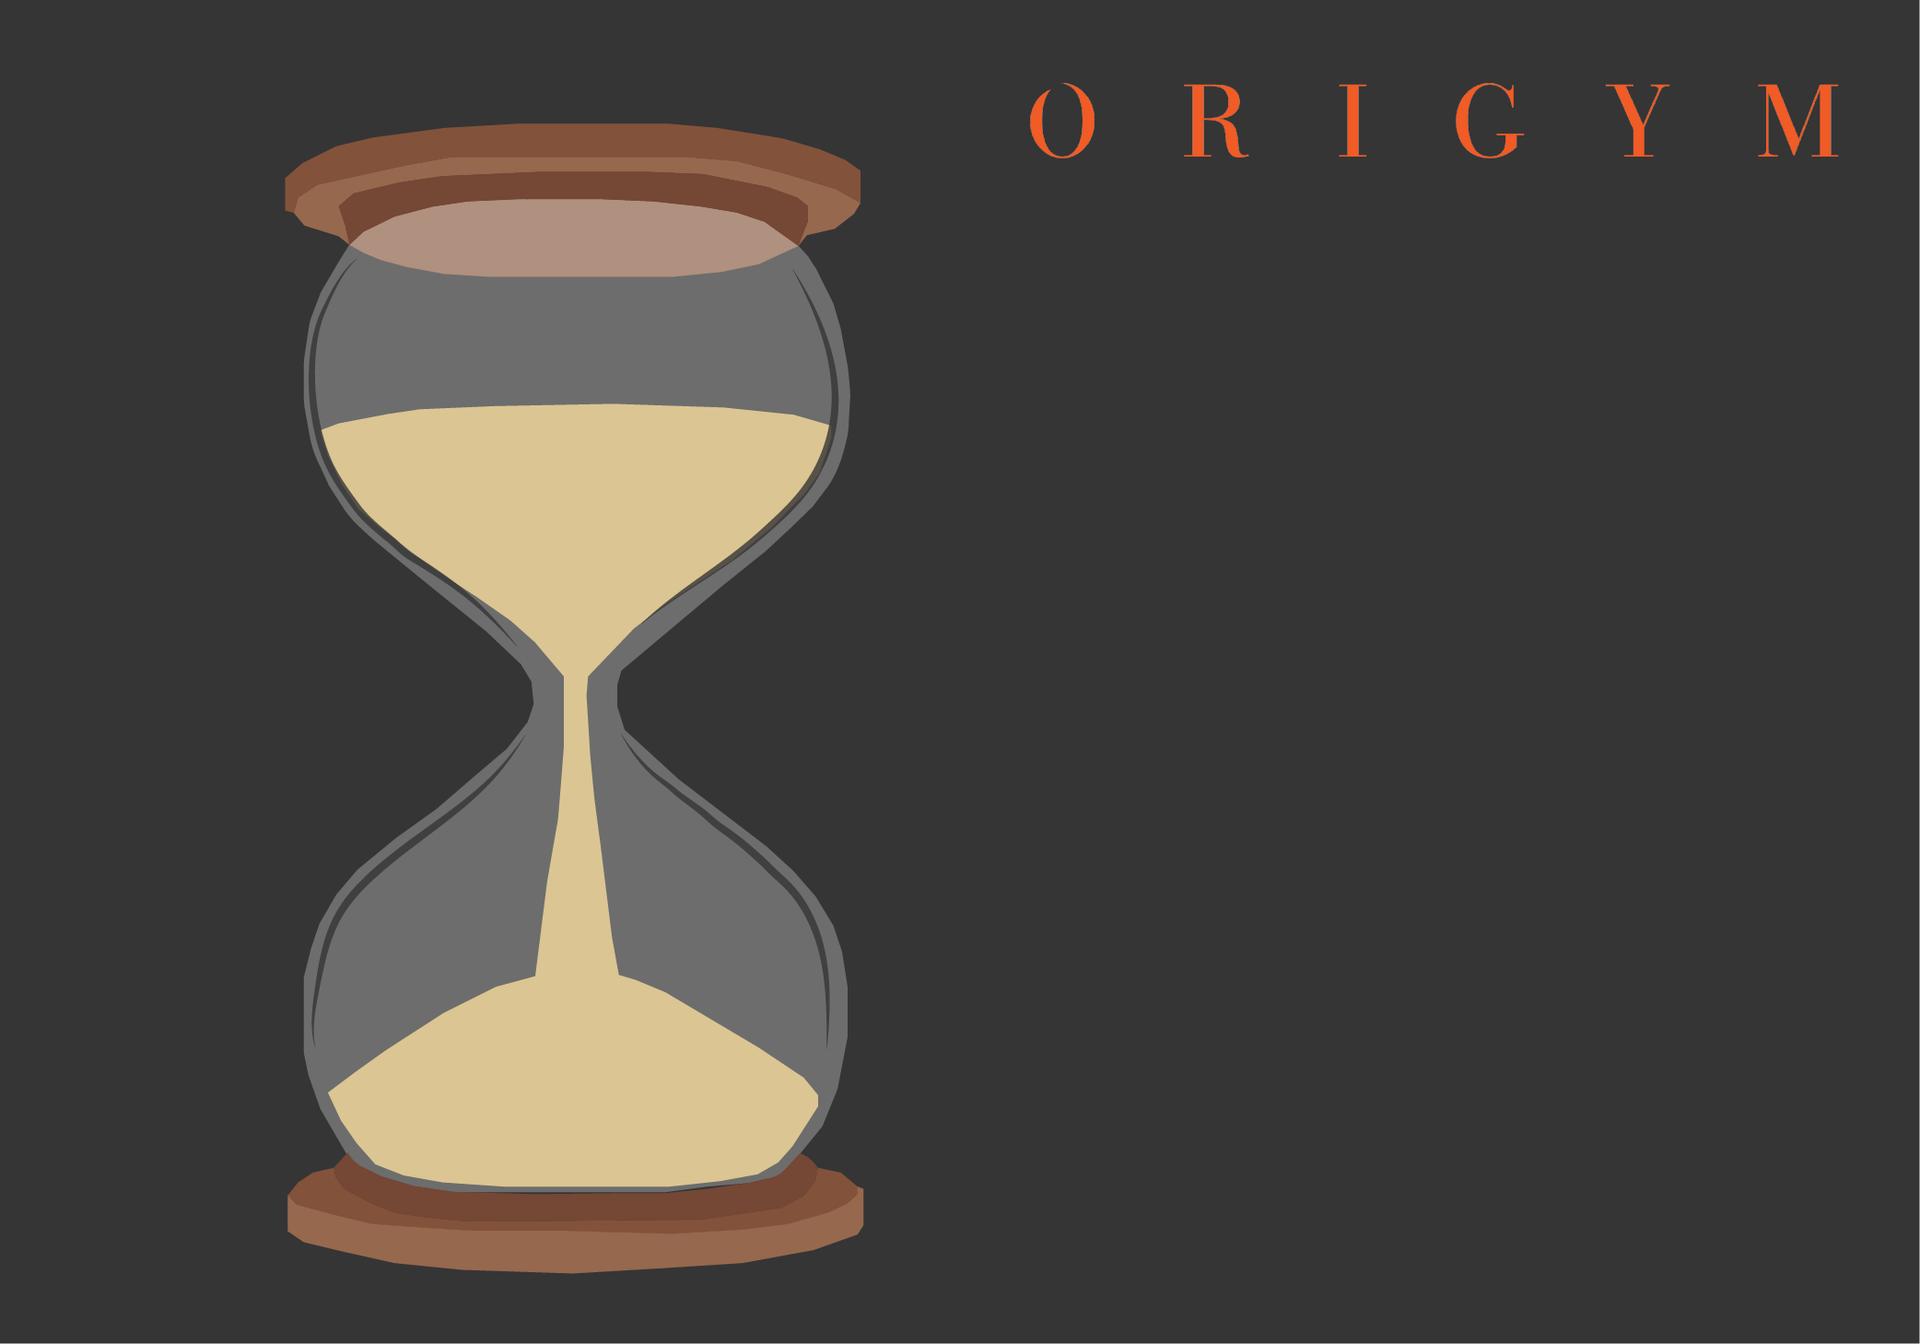 Yoga Teacher Job Description 2020 Origym